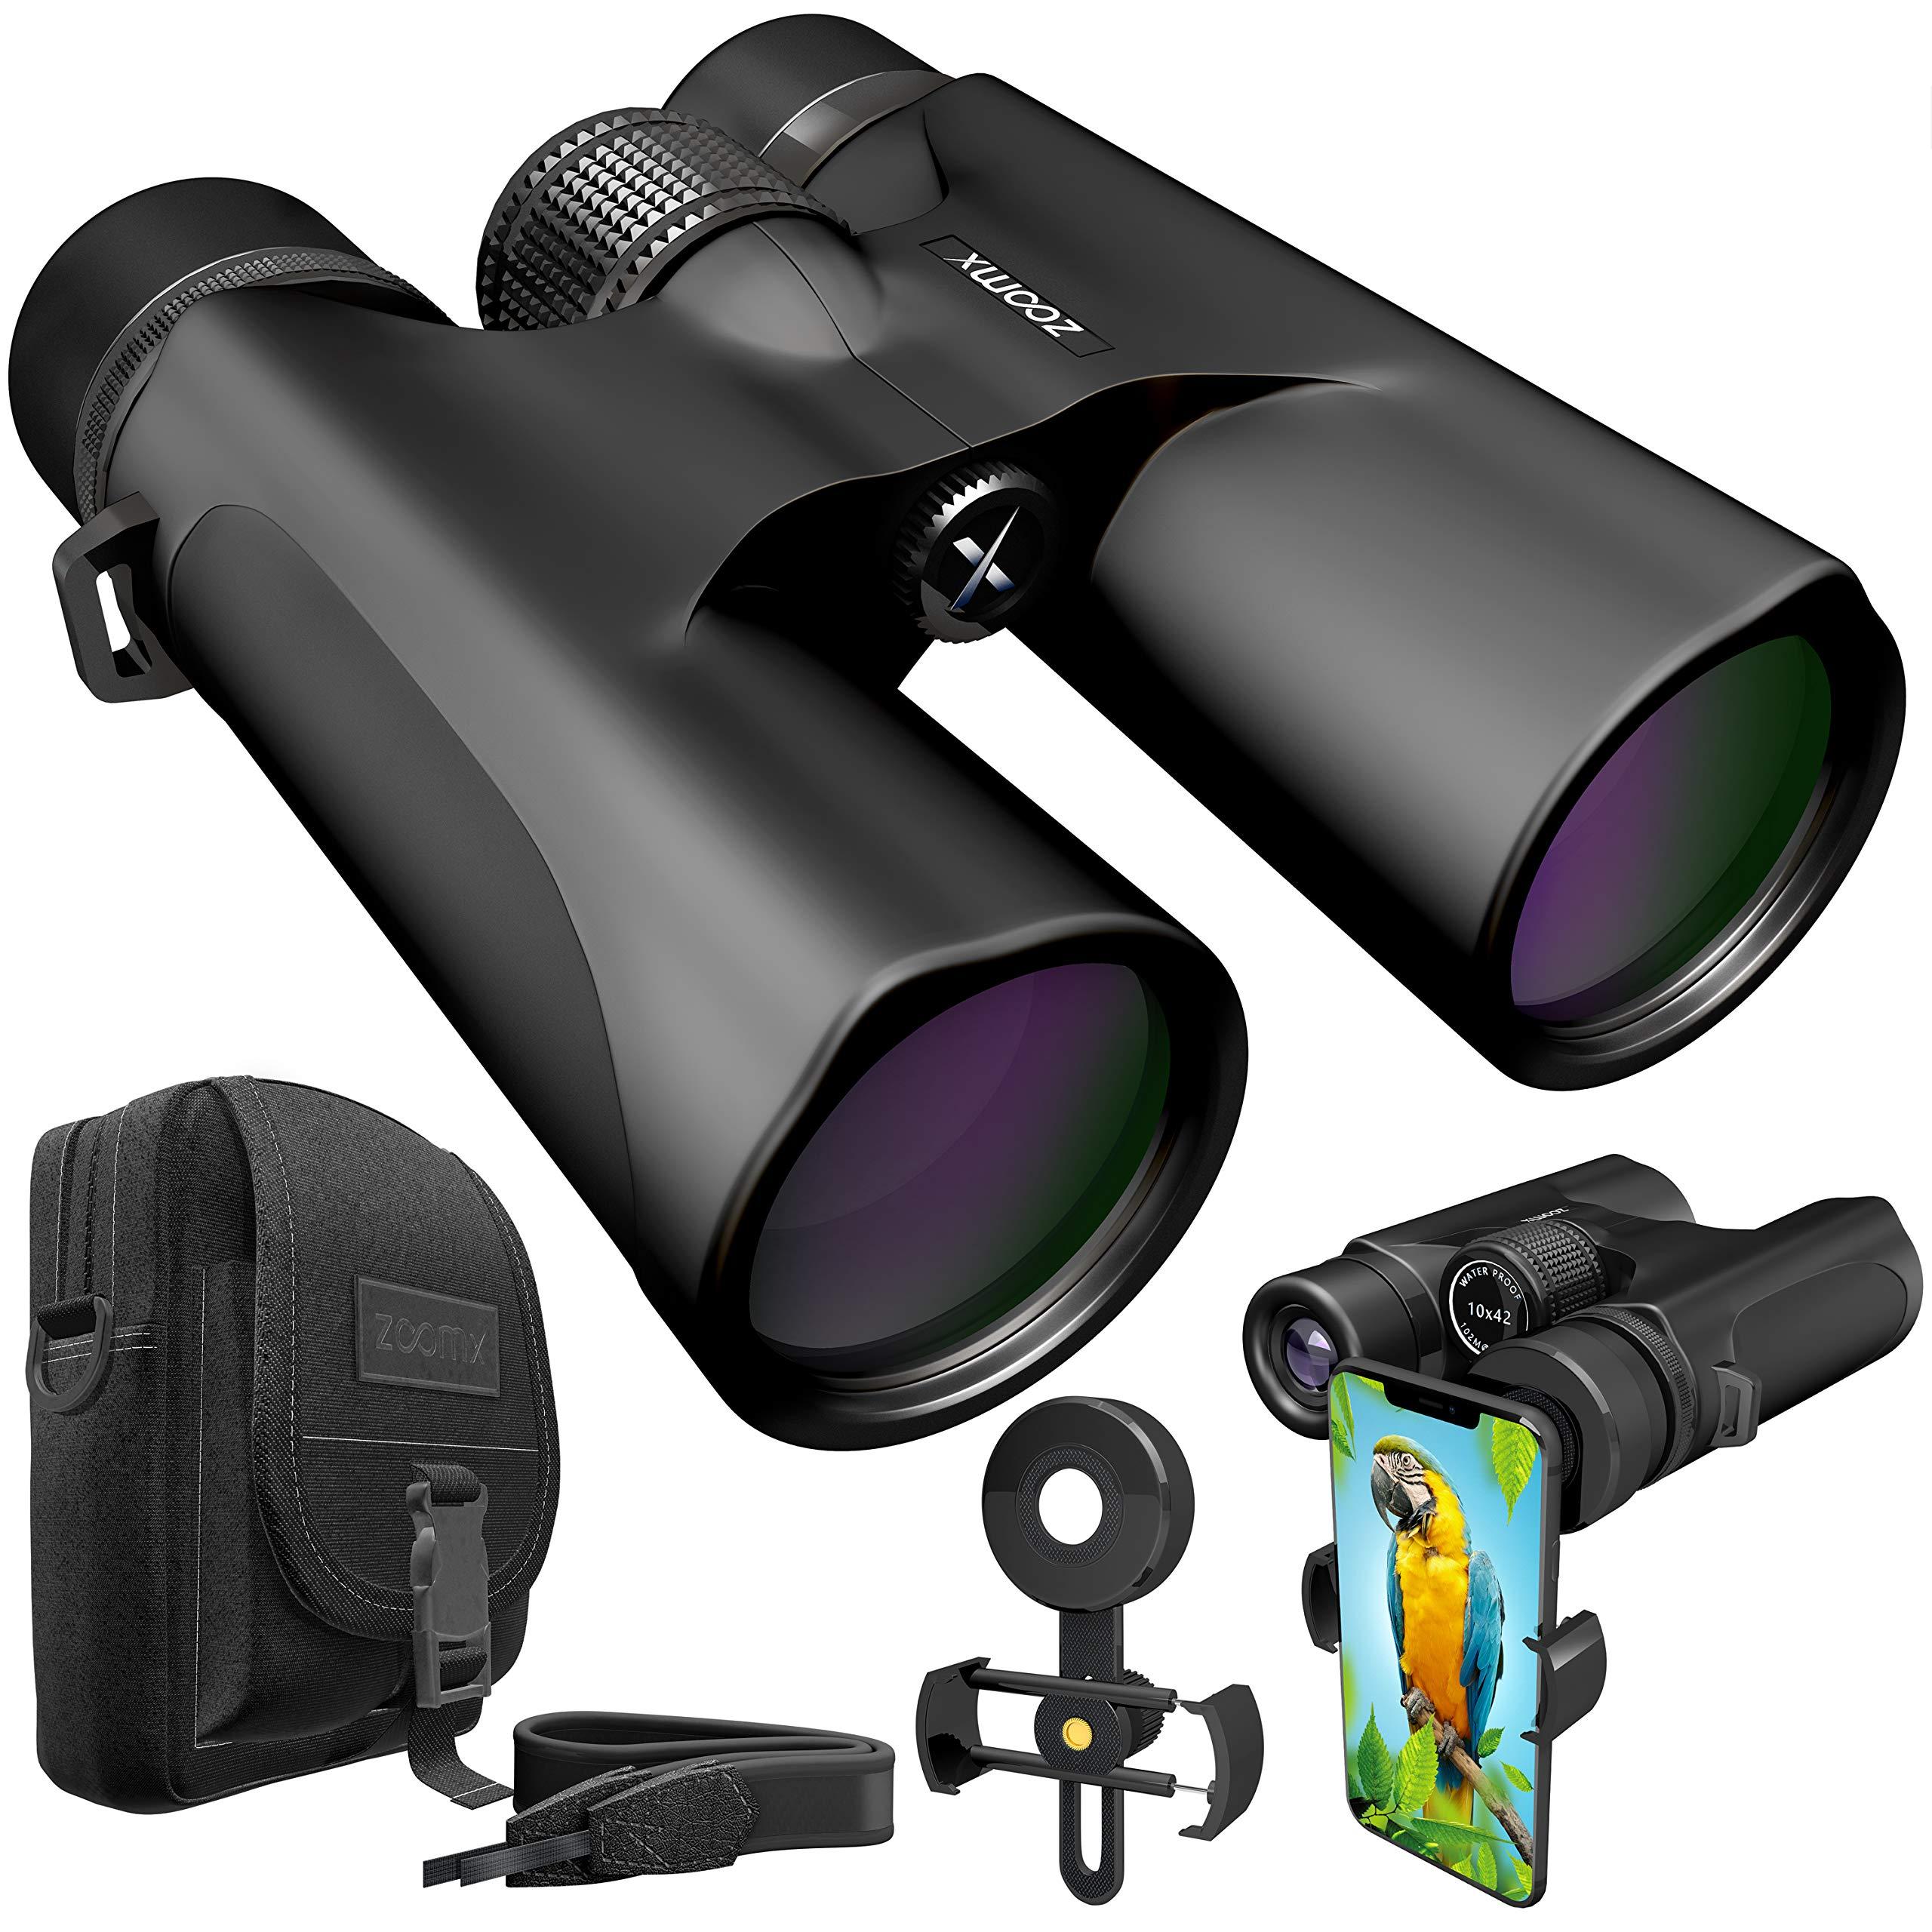 ZoomX Binoculars for Adults. 10x42 Waterproof Lightweight Compact Binocular Prism Bak4. HD Binocular for Bird Watching Hunting Traveling and Sightseeing with Smartphone Adapter, Grey by Stellax